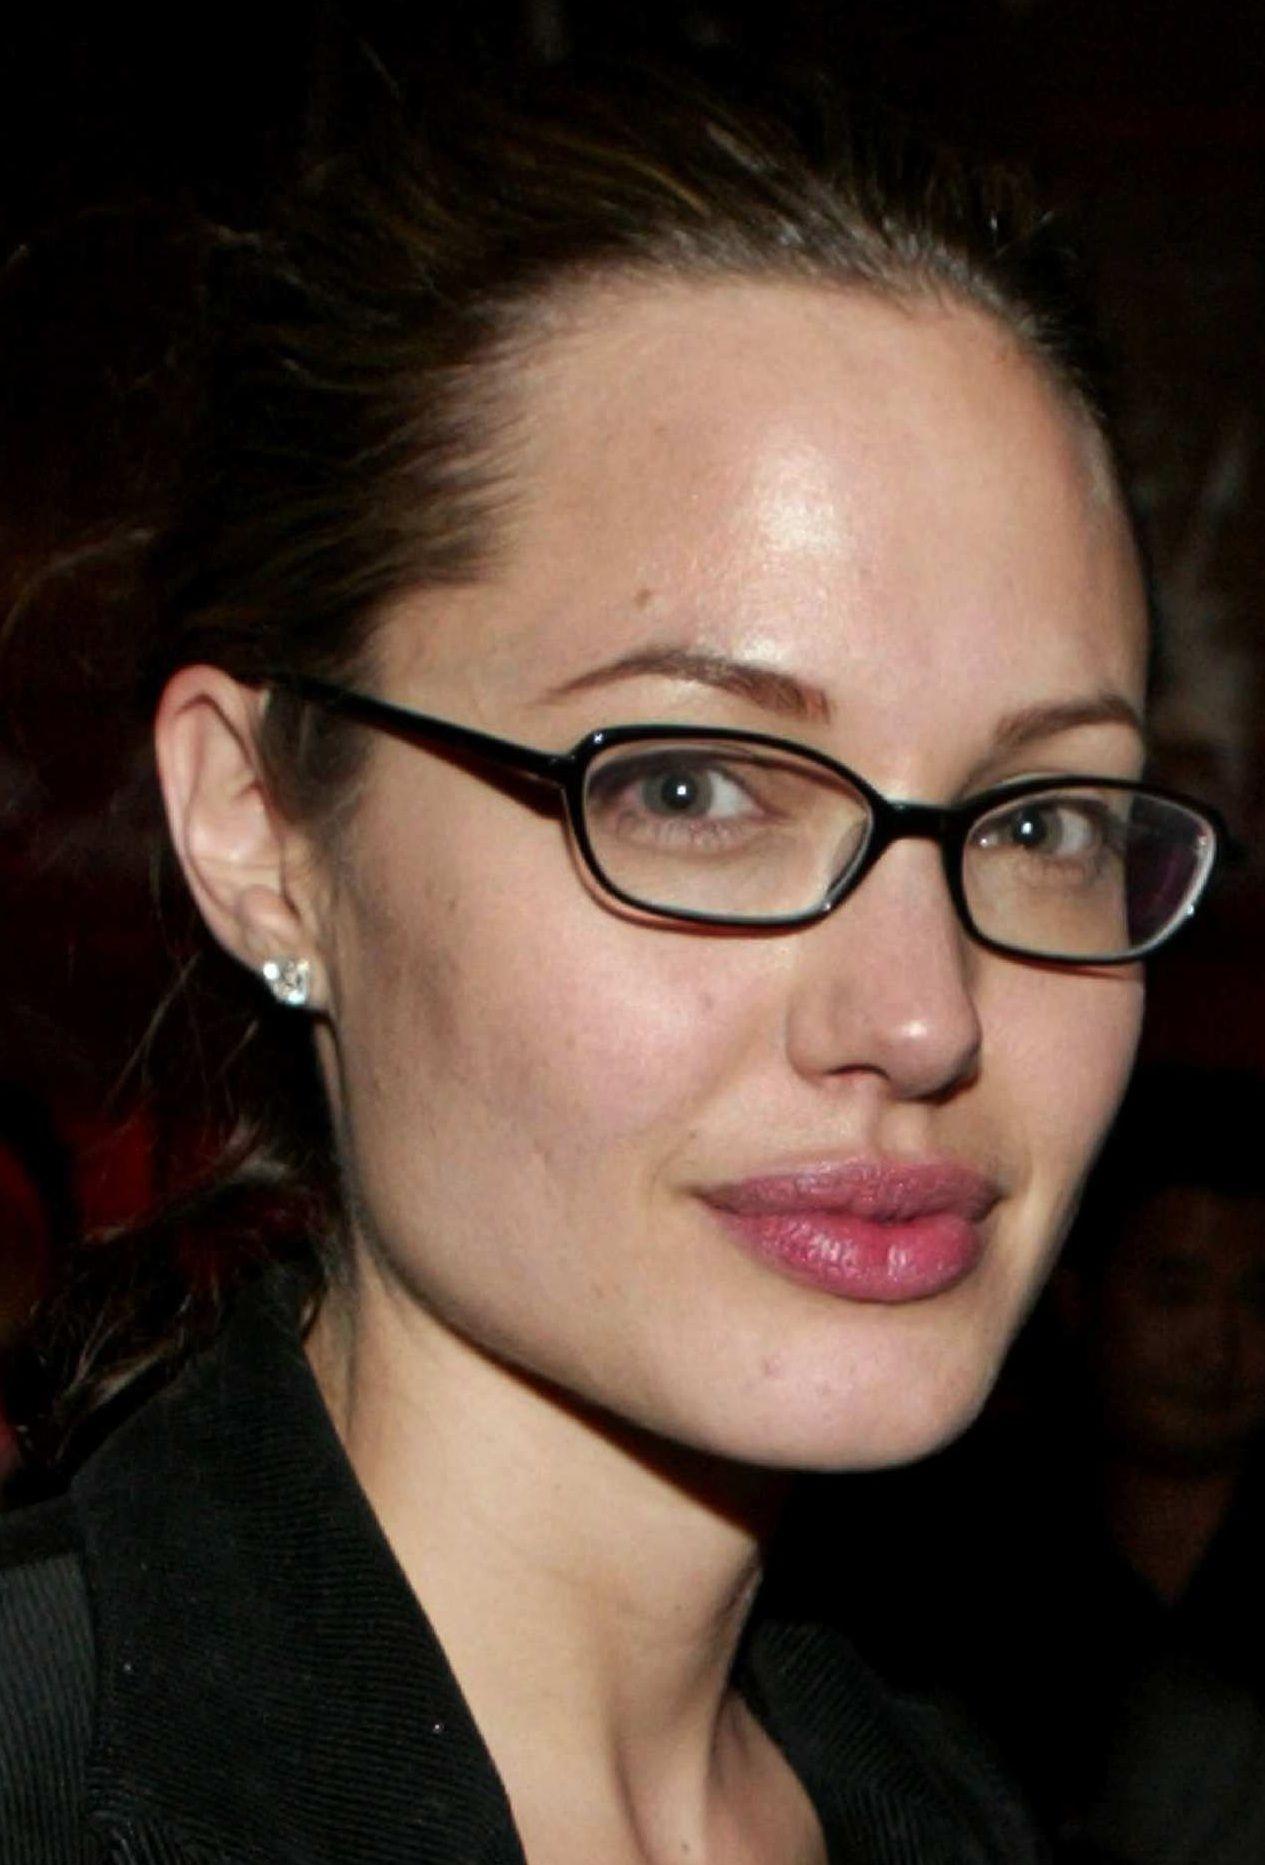 bbf333850a Angelina Jolie with glasses ❤